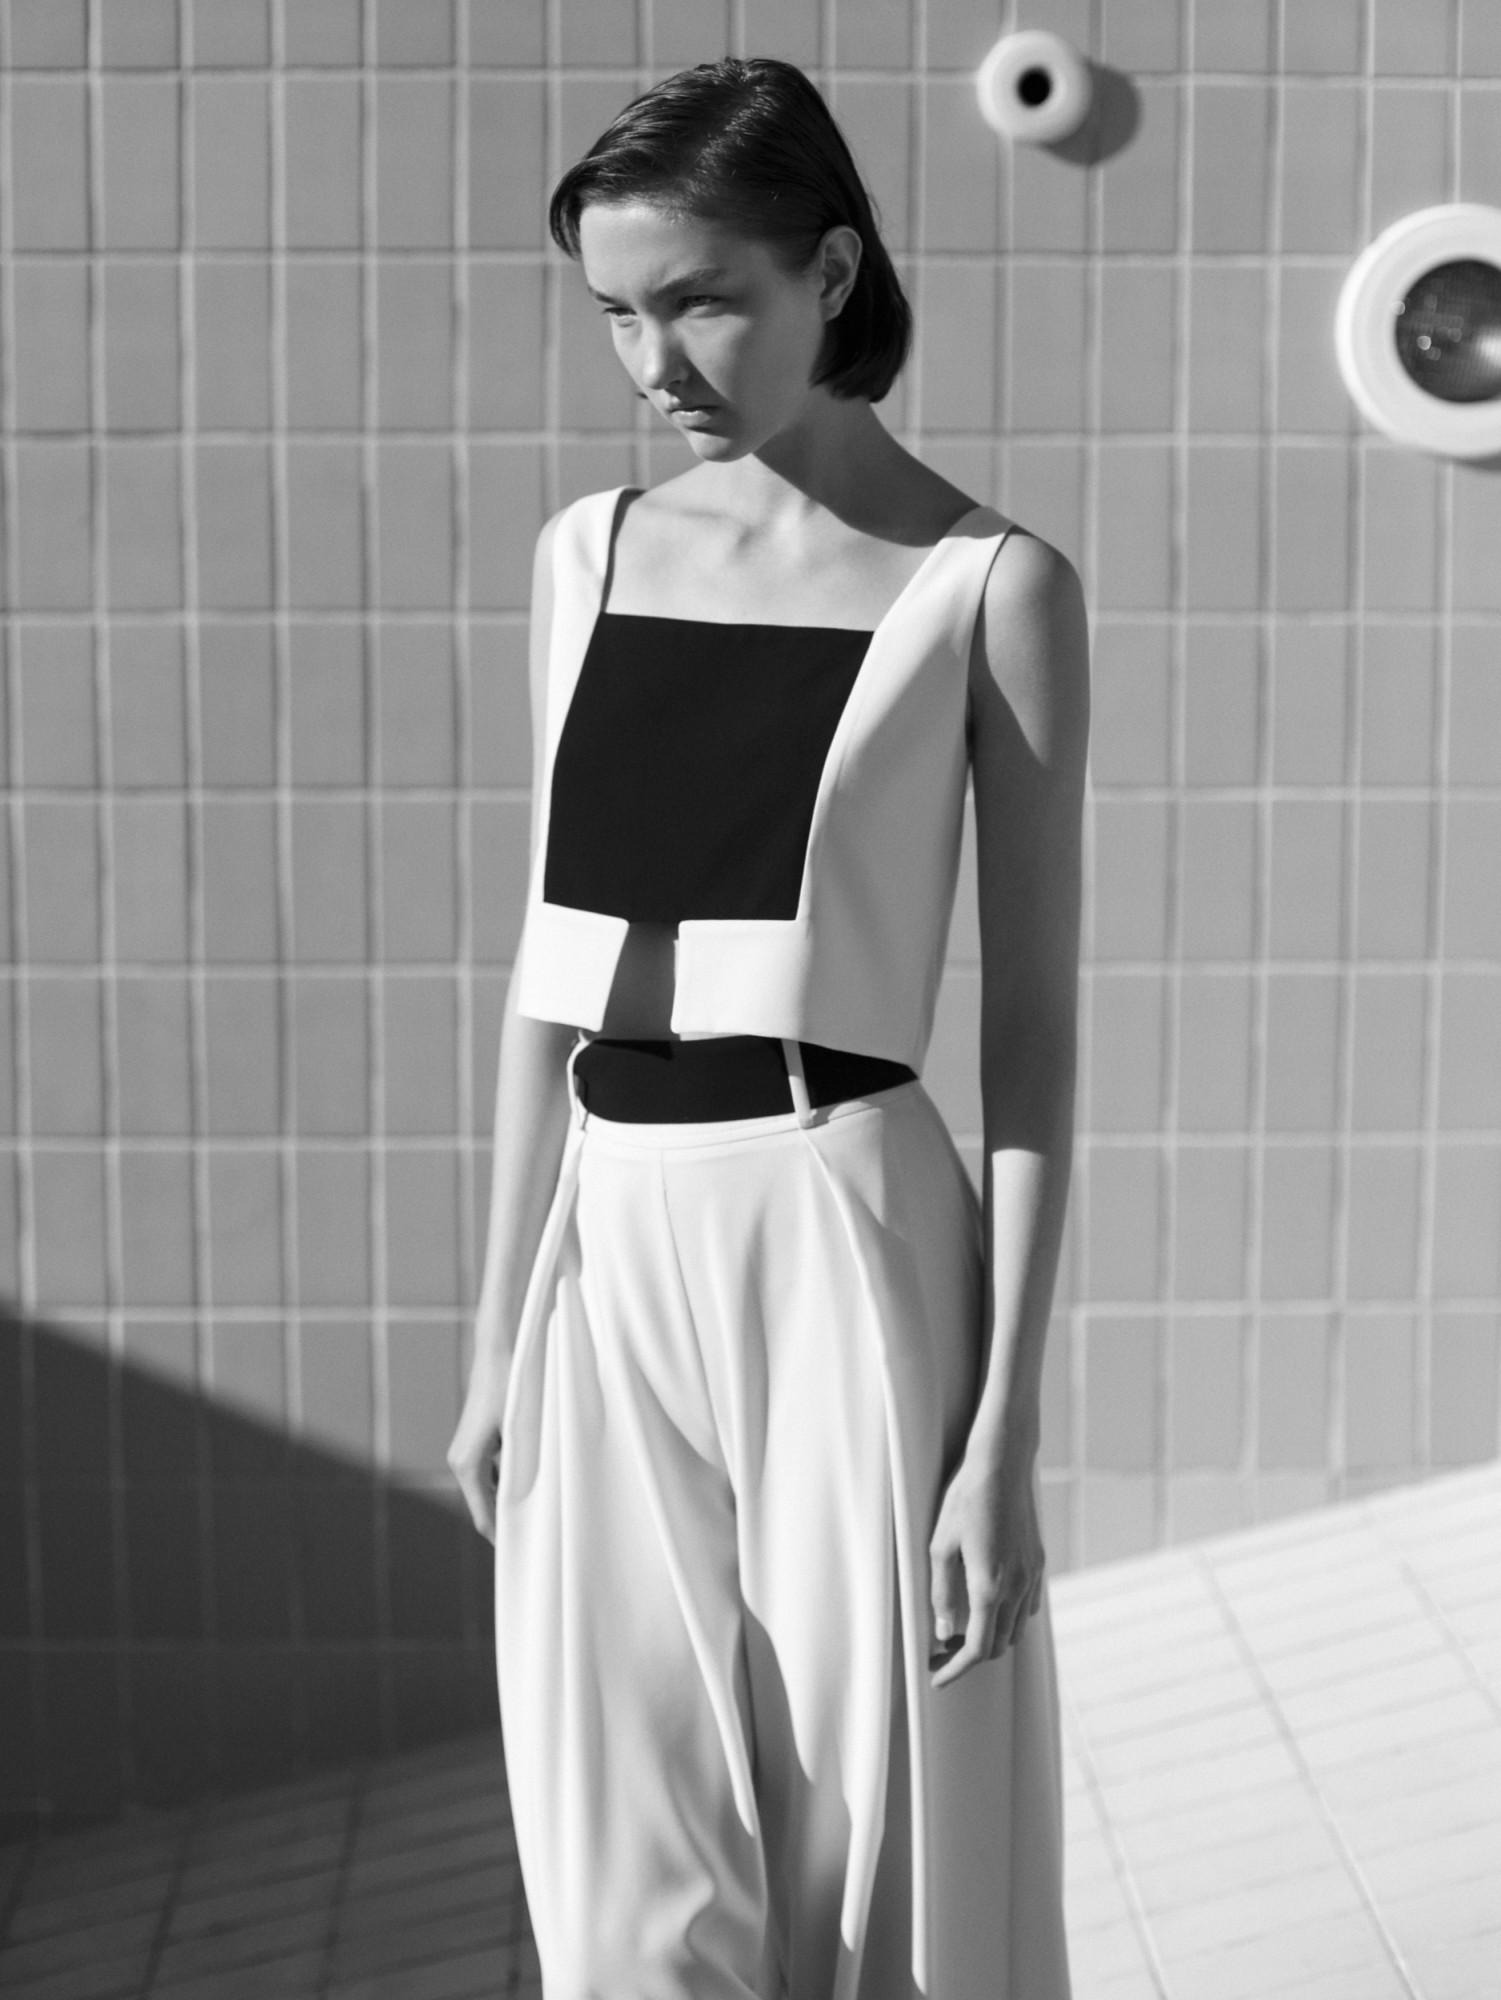 Touché: Η Womenswear Designer της χρονιάς των ELLE Fashion Young Talents Awards μάς παρουσιάζει τη νέα της so chic συλλογή